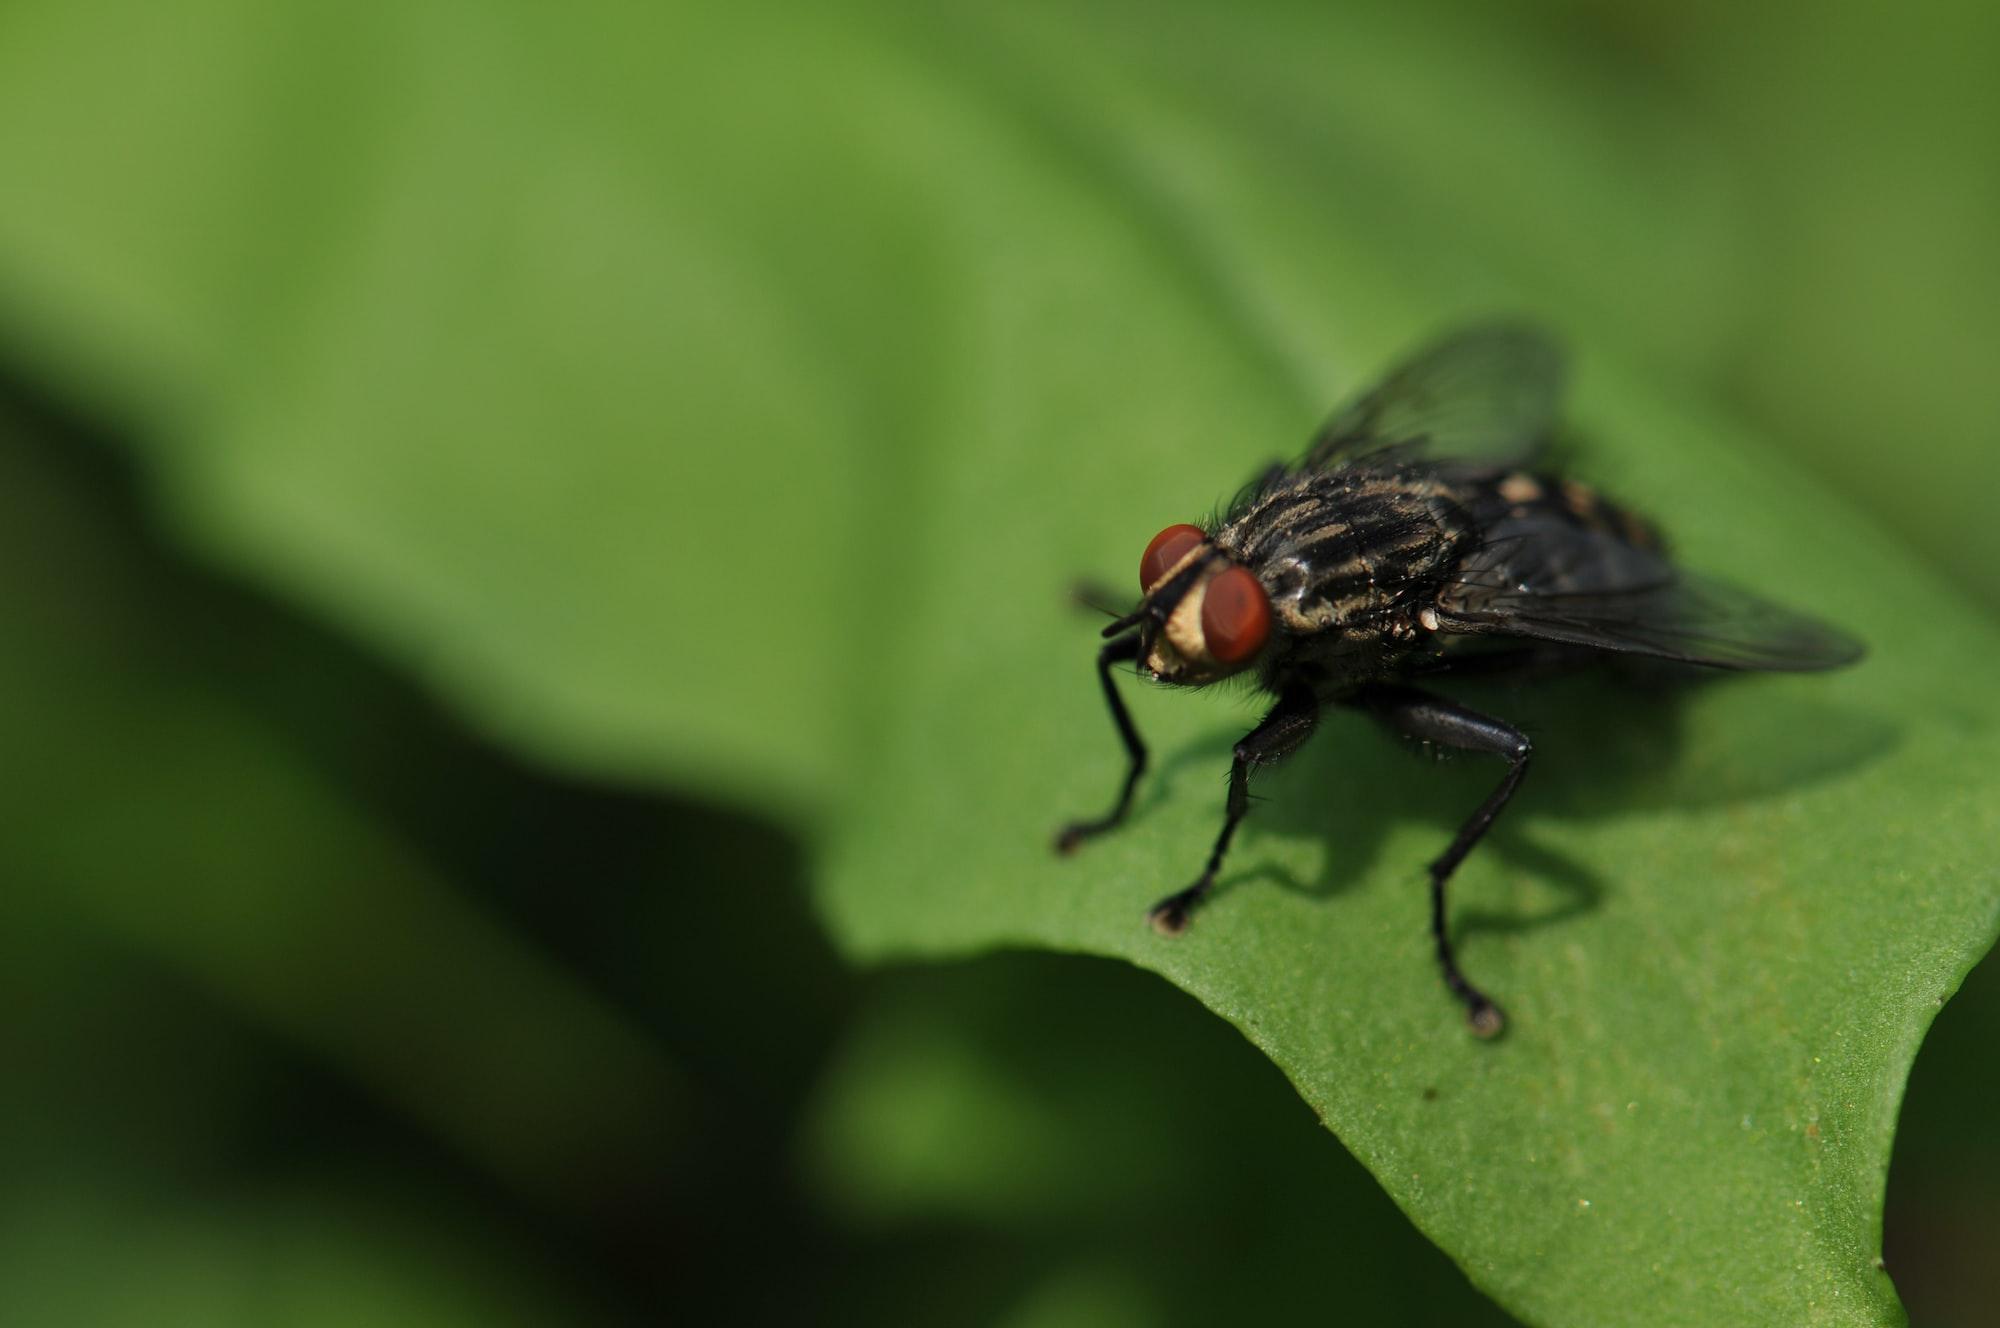 Squashing Bugs